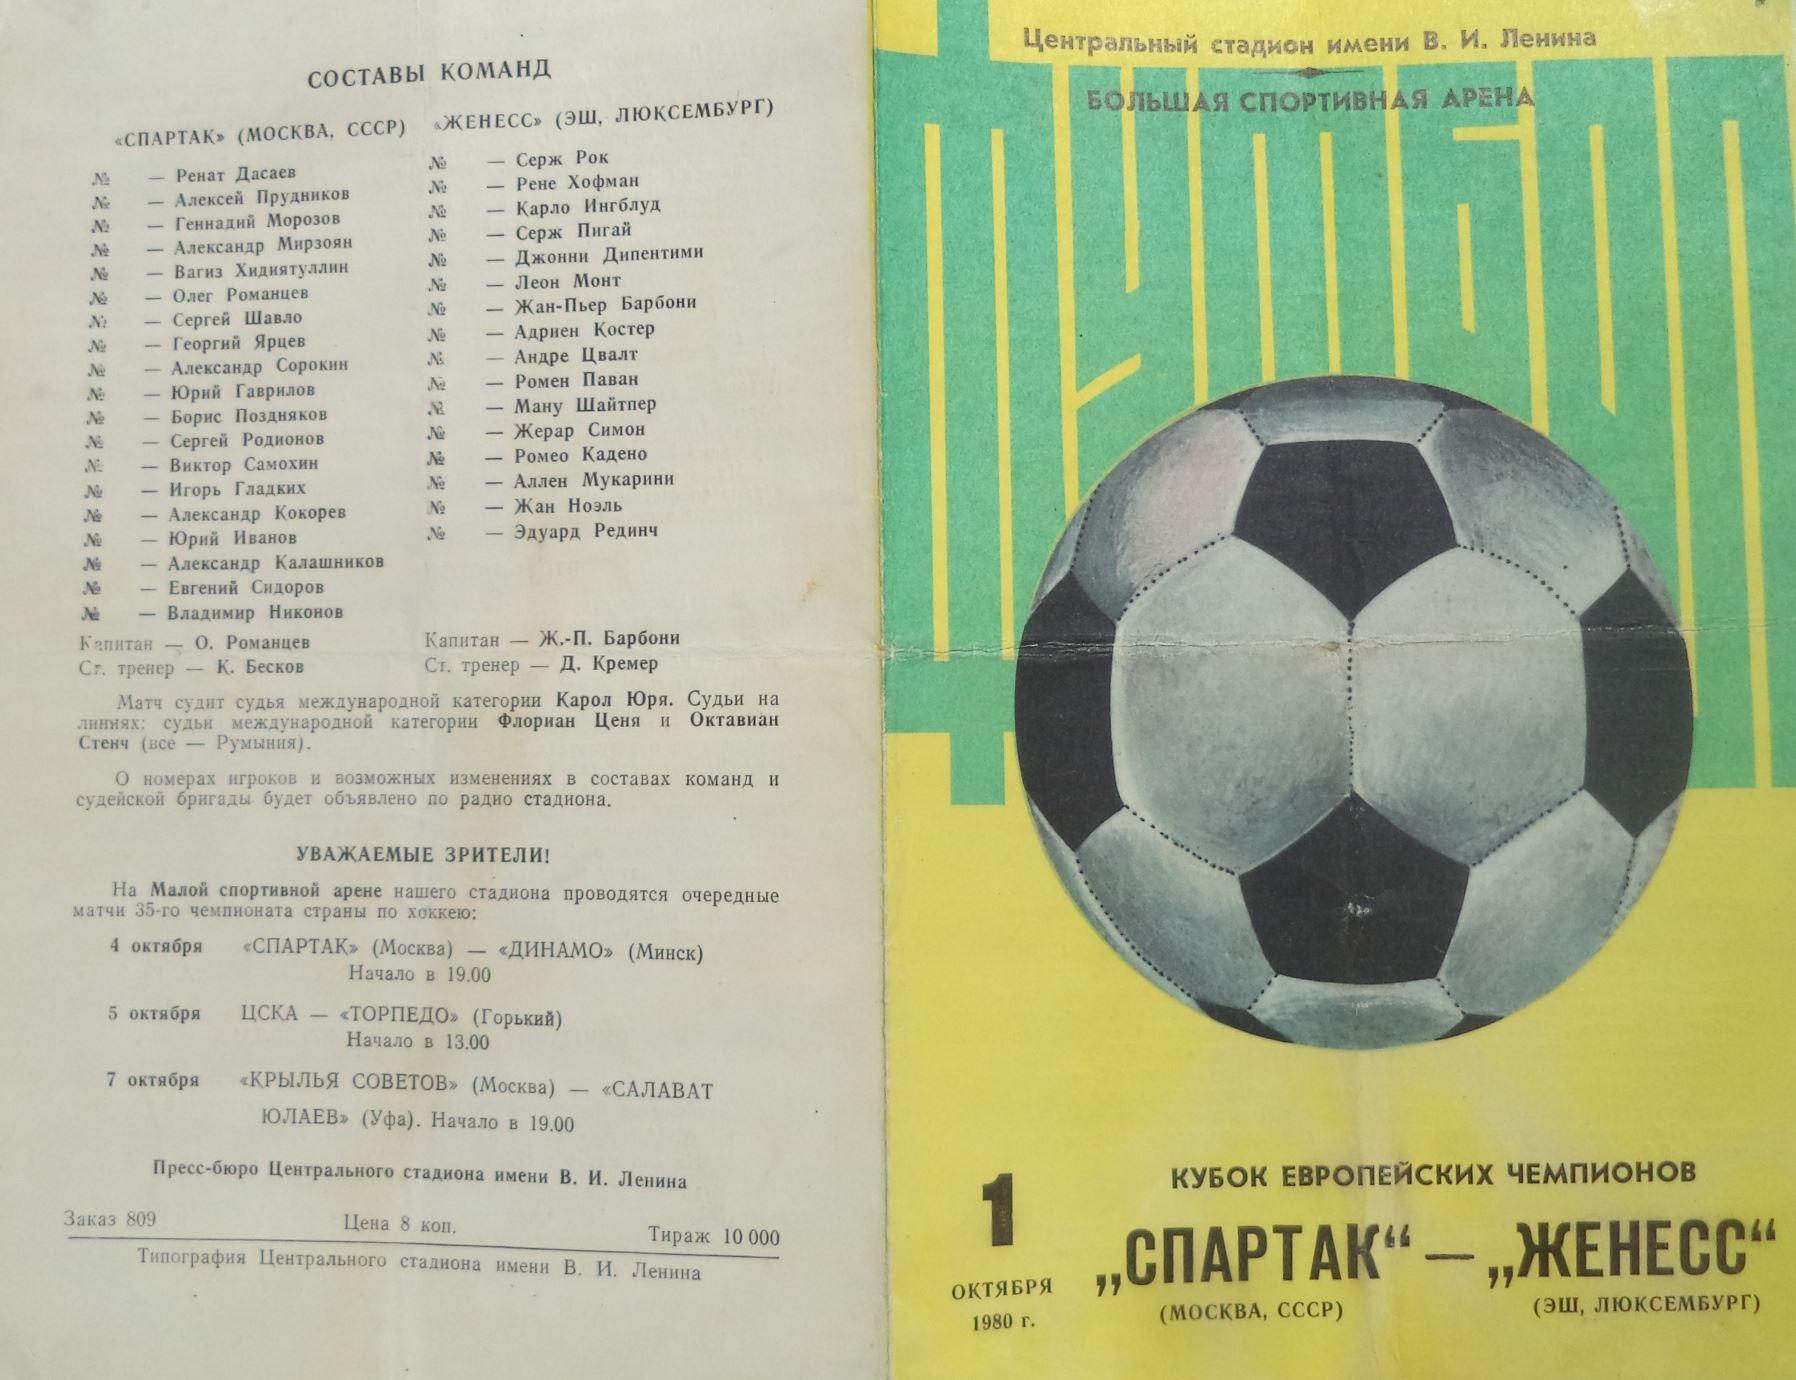 Спартак (СССР) - Женнес Эш (Люксембург) 4:0